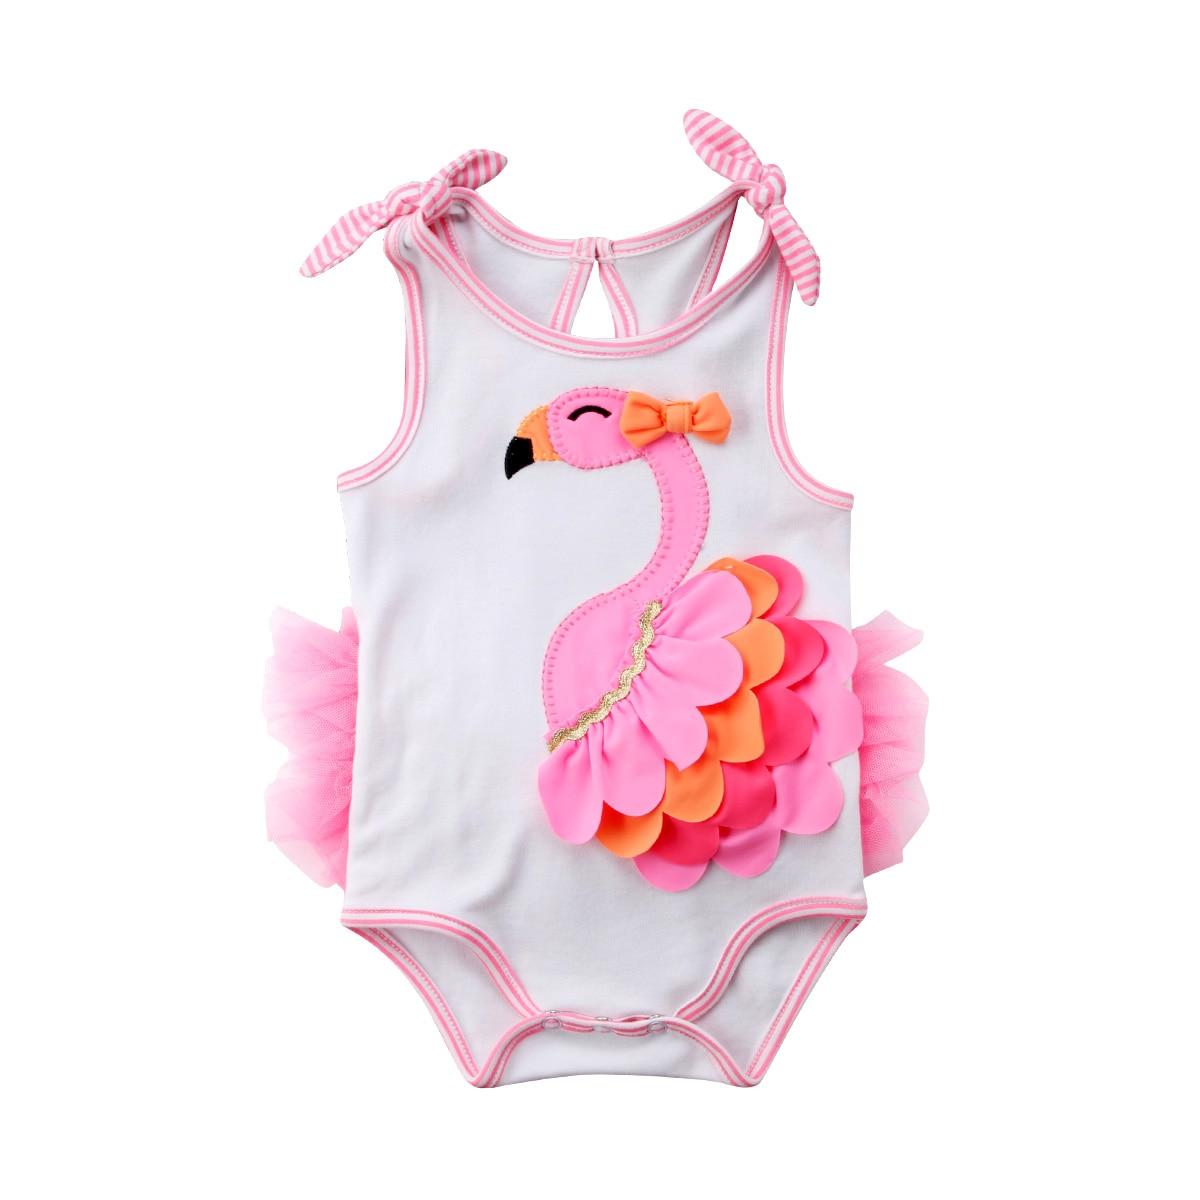 Newborn Baby Girls 3D Flamingo Petal Romper Jumpsuit Outfits Summer Clothes